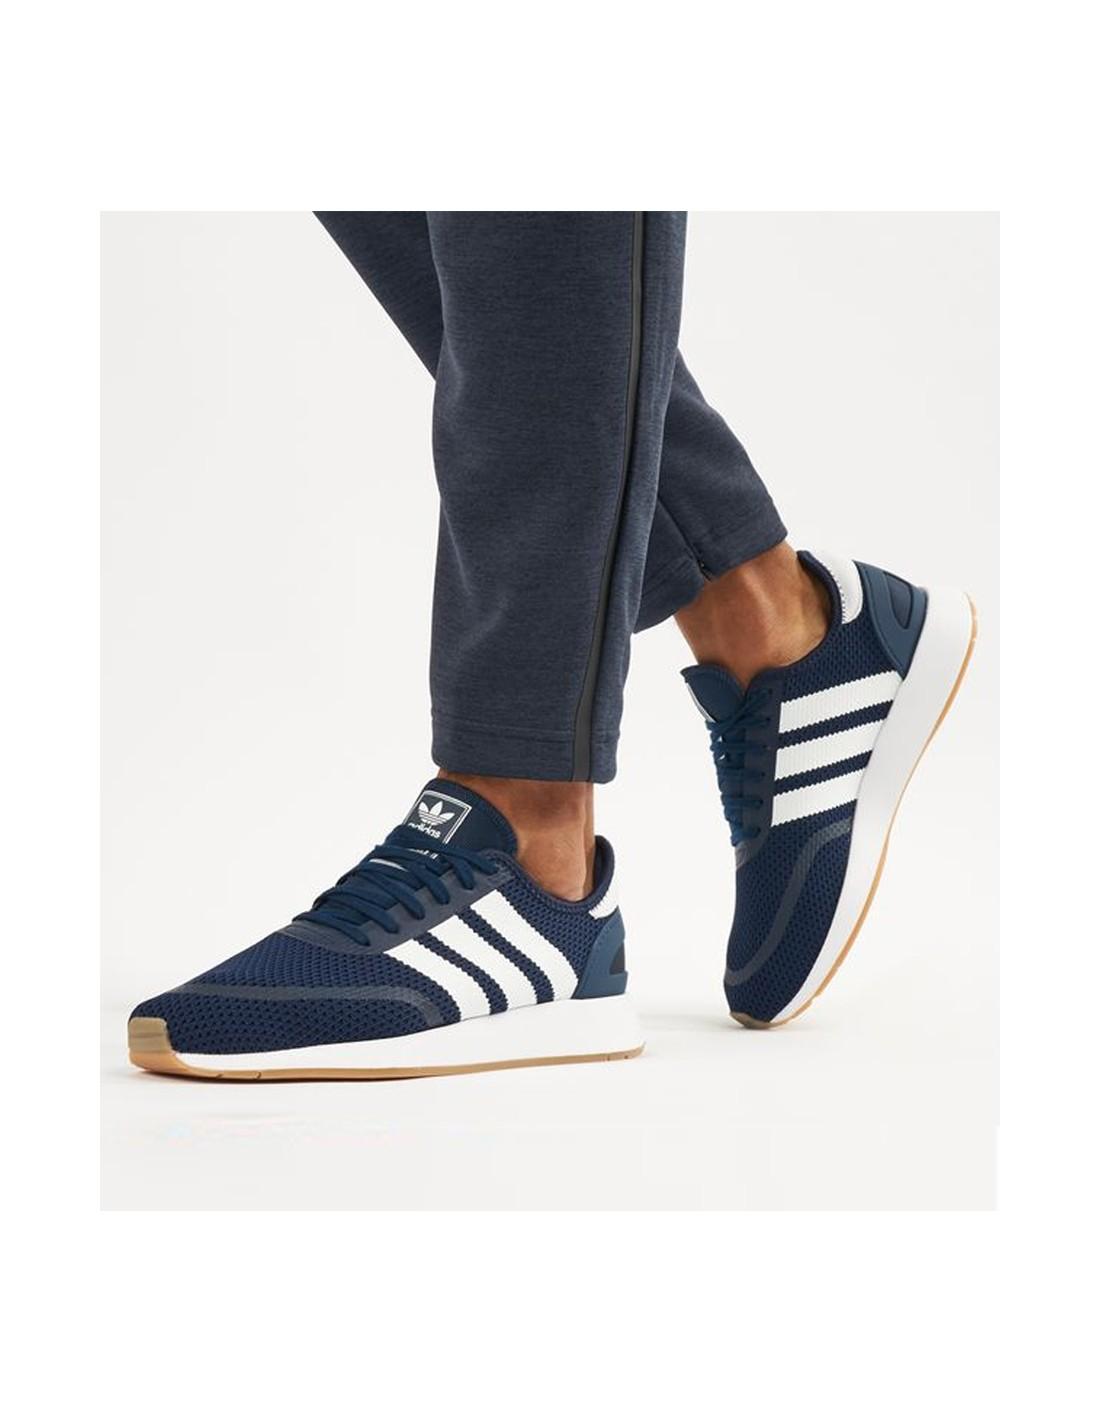 Adidas Originals N 5923 Shoes Blue B37959